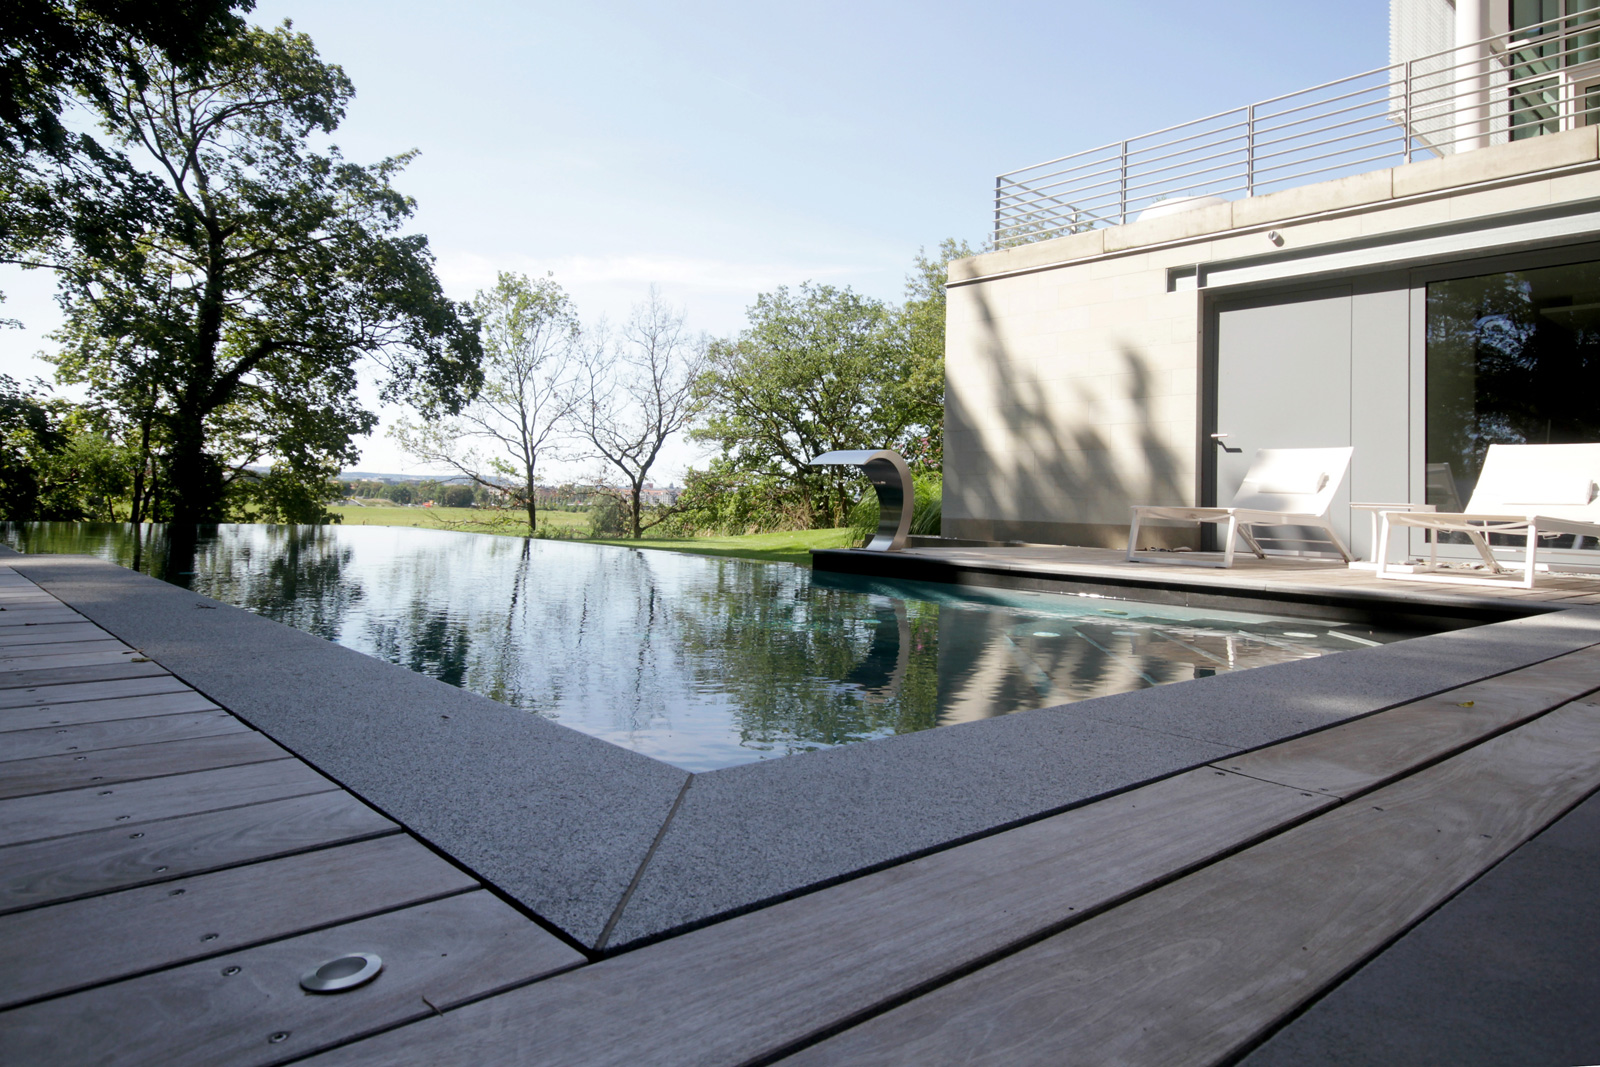 gartenmanufaktur-nuessler-garten-dresden-pool